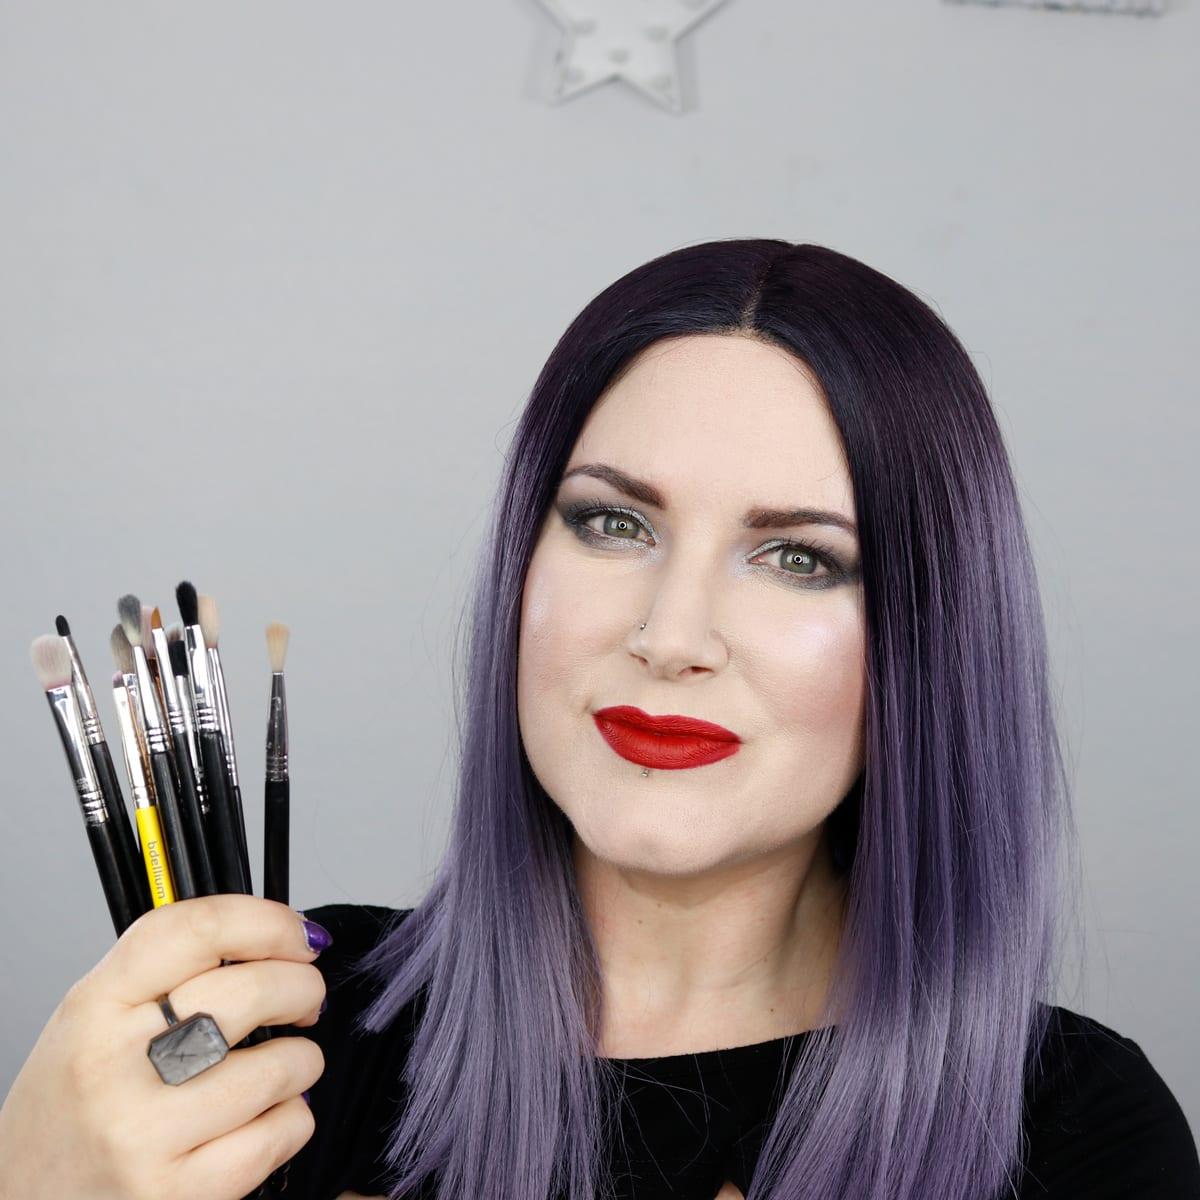 Best Eyeshadow Brushes For Hooded Eyes How I Use Them